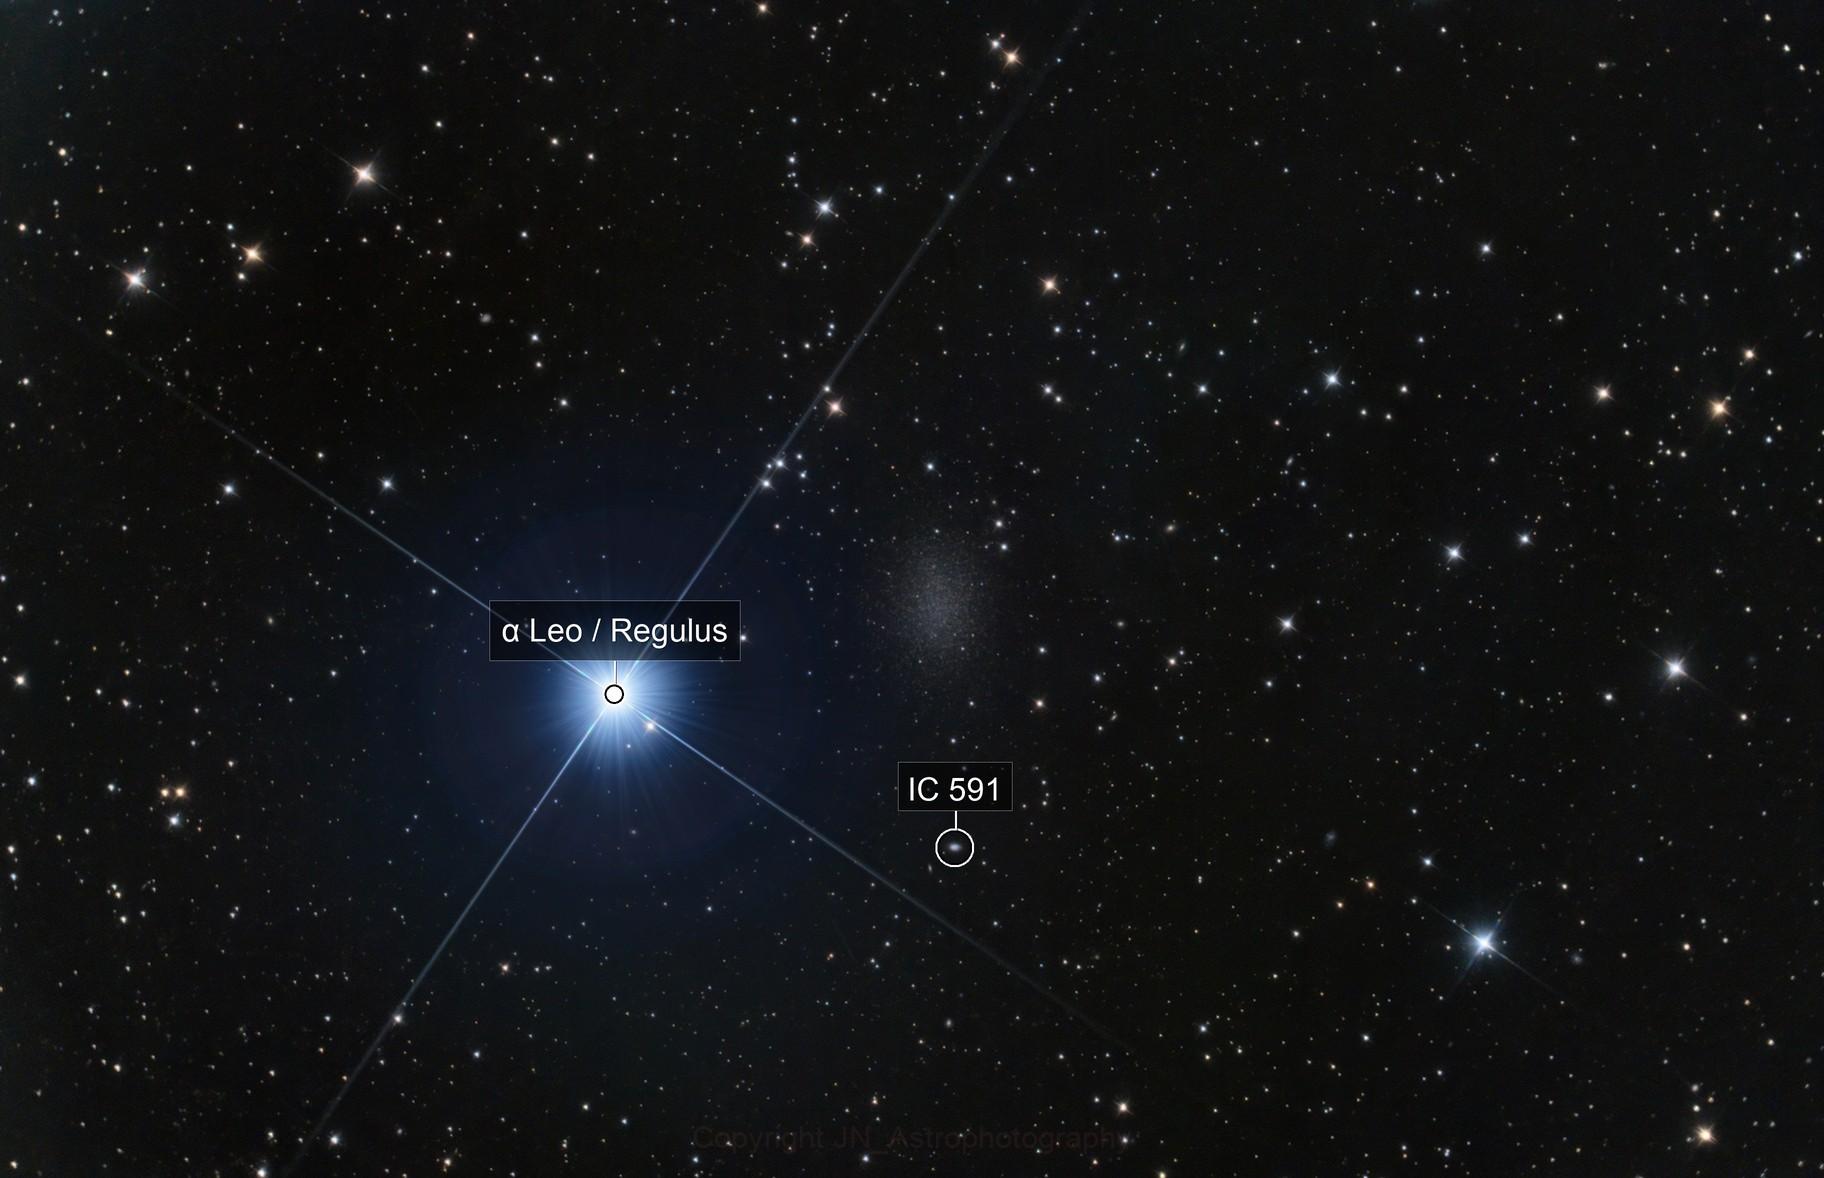 Leo I dwarf galaxy & Regulus